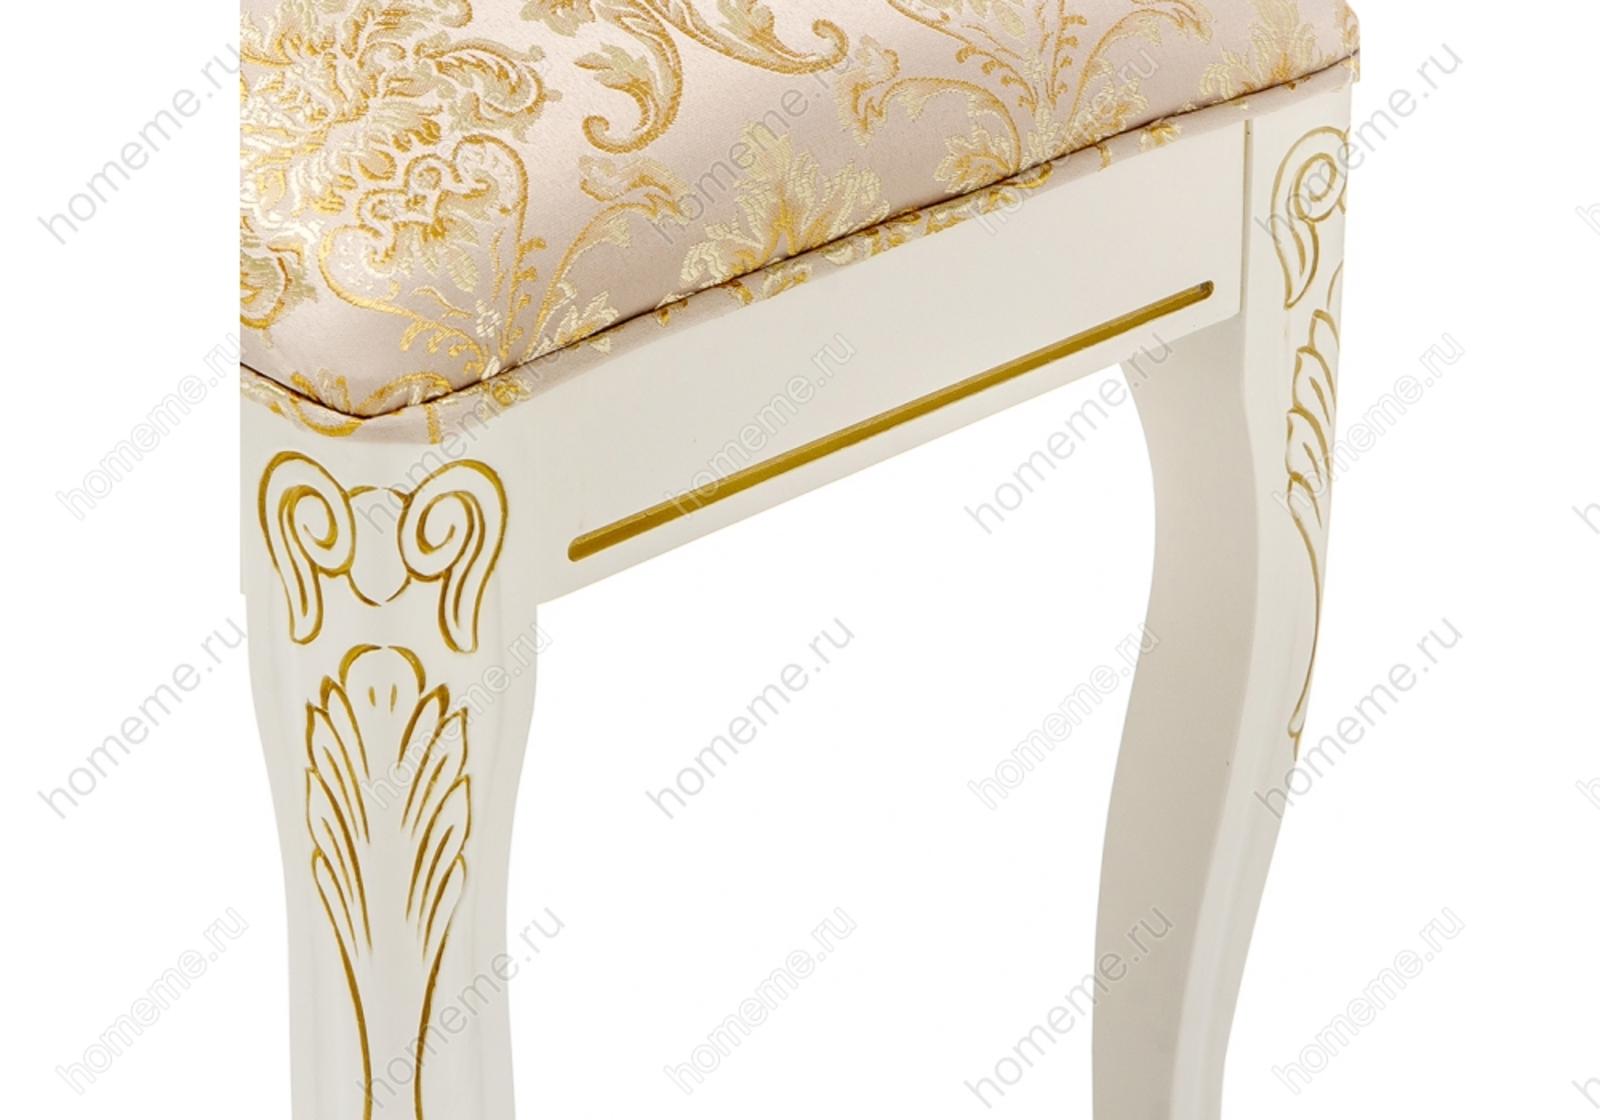 Стул деревянный Валентино патина золото / бежевый 309320 Валентино патина золото / бежевый 309320 (16088)